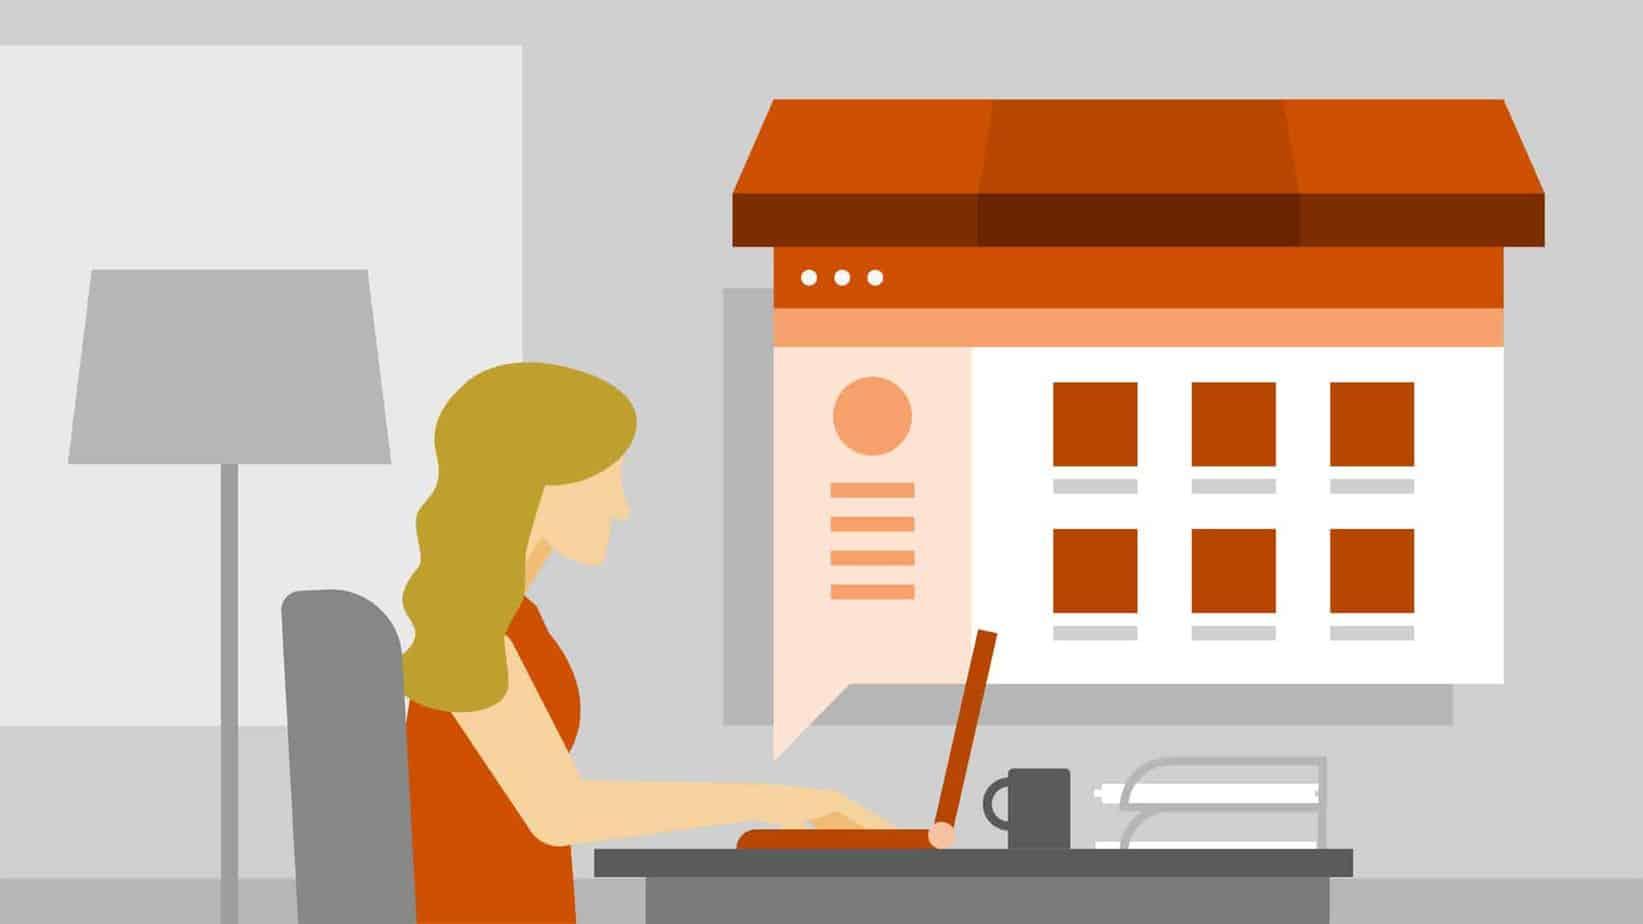 How To Start An Online Business 2020